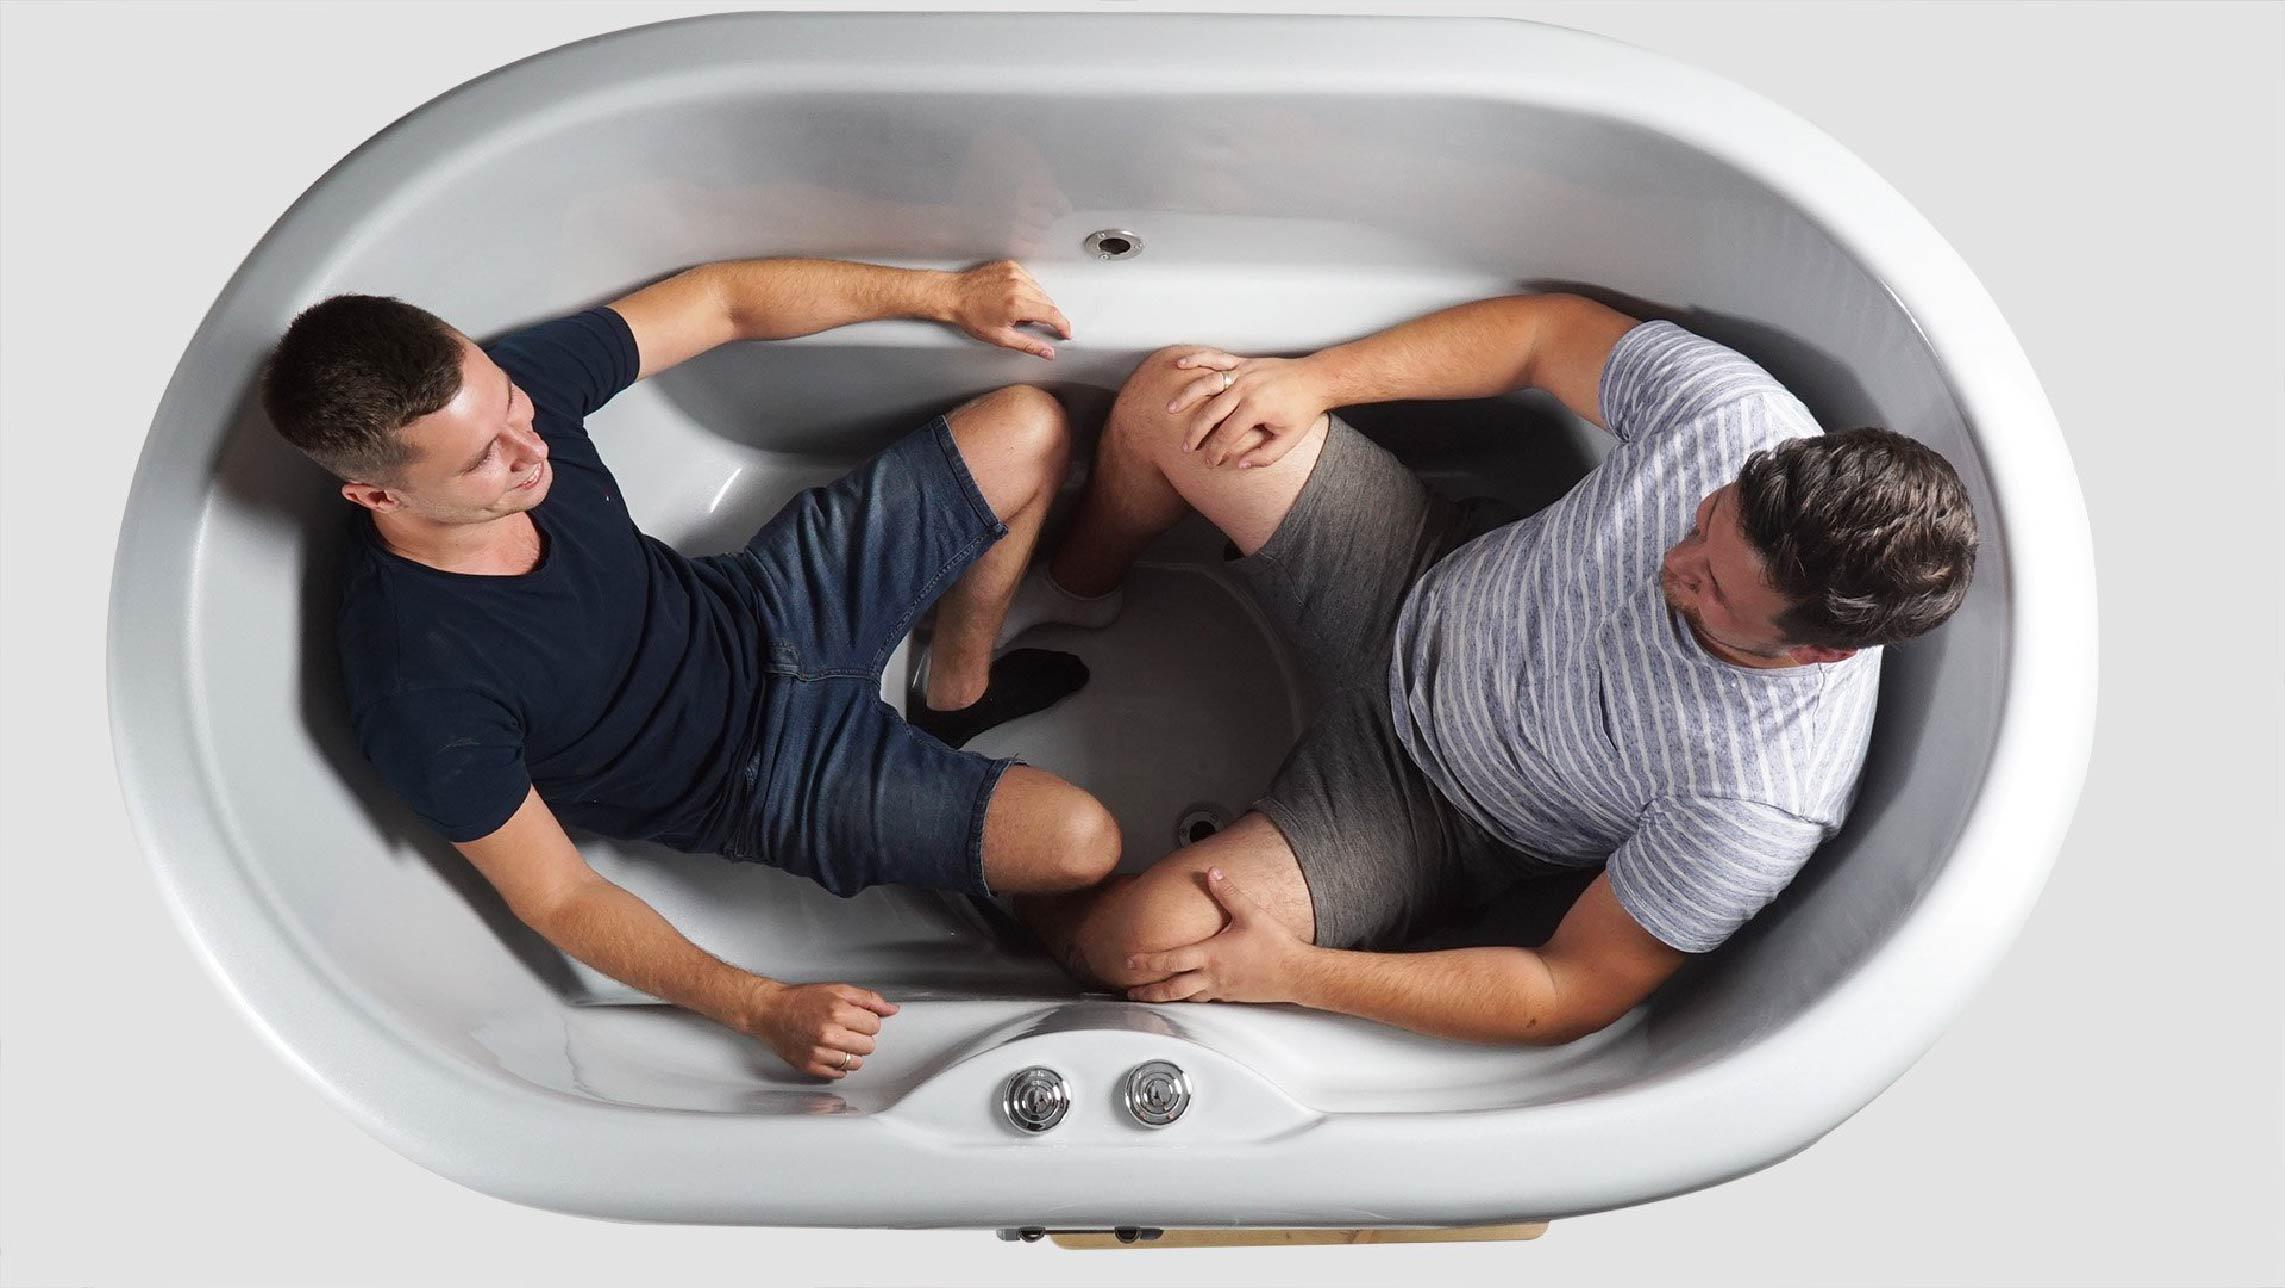 Dimensioni Vasca Da Bagno Circolare : Spa tinozza vasca tinozza vasca in vetroresina hot tub team